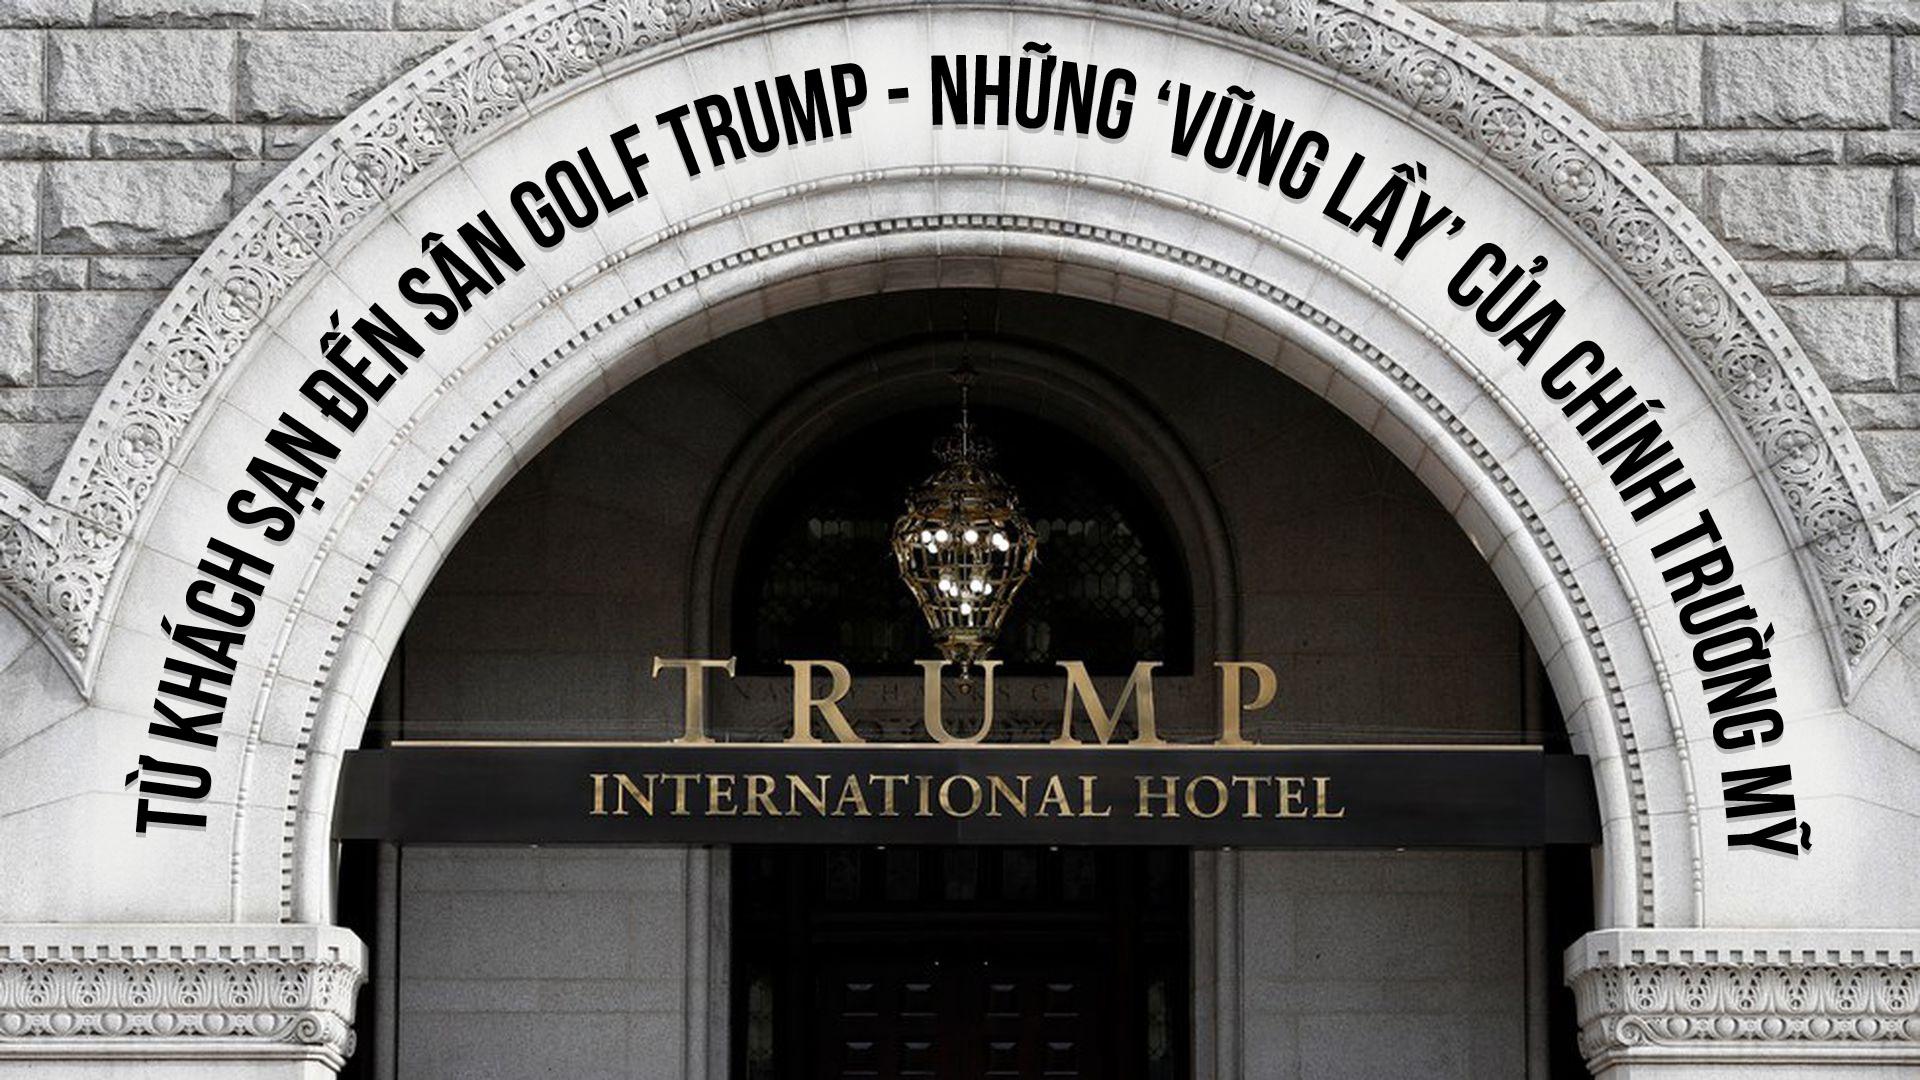 van dong hanh lang duoi thoi Trump anh 1